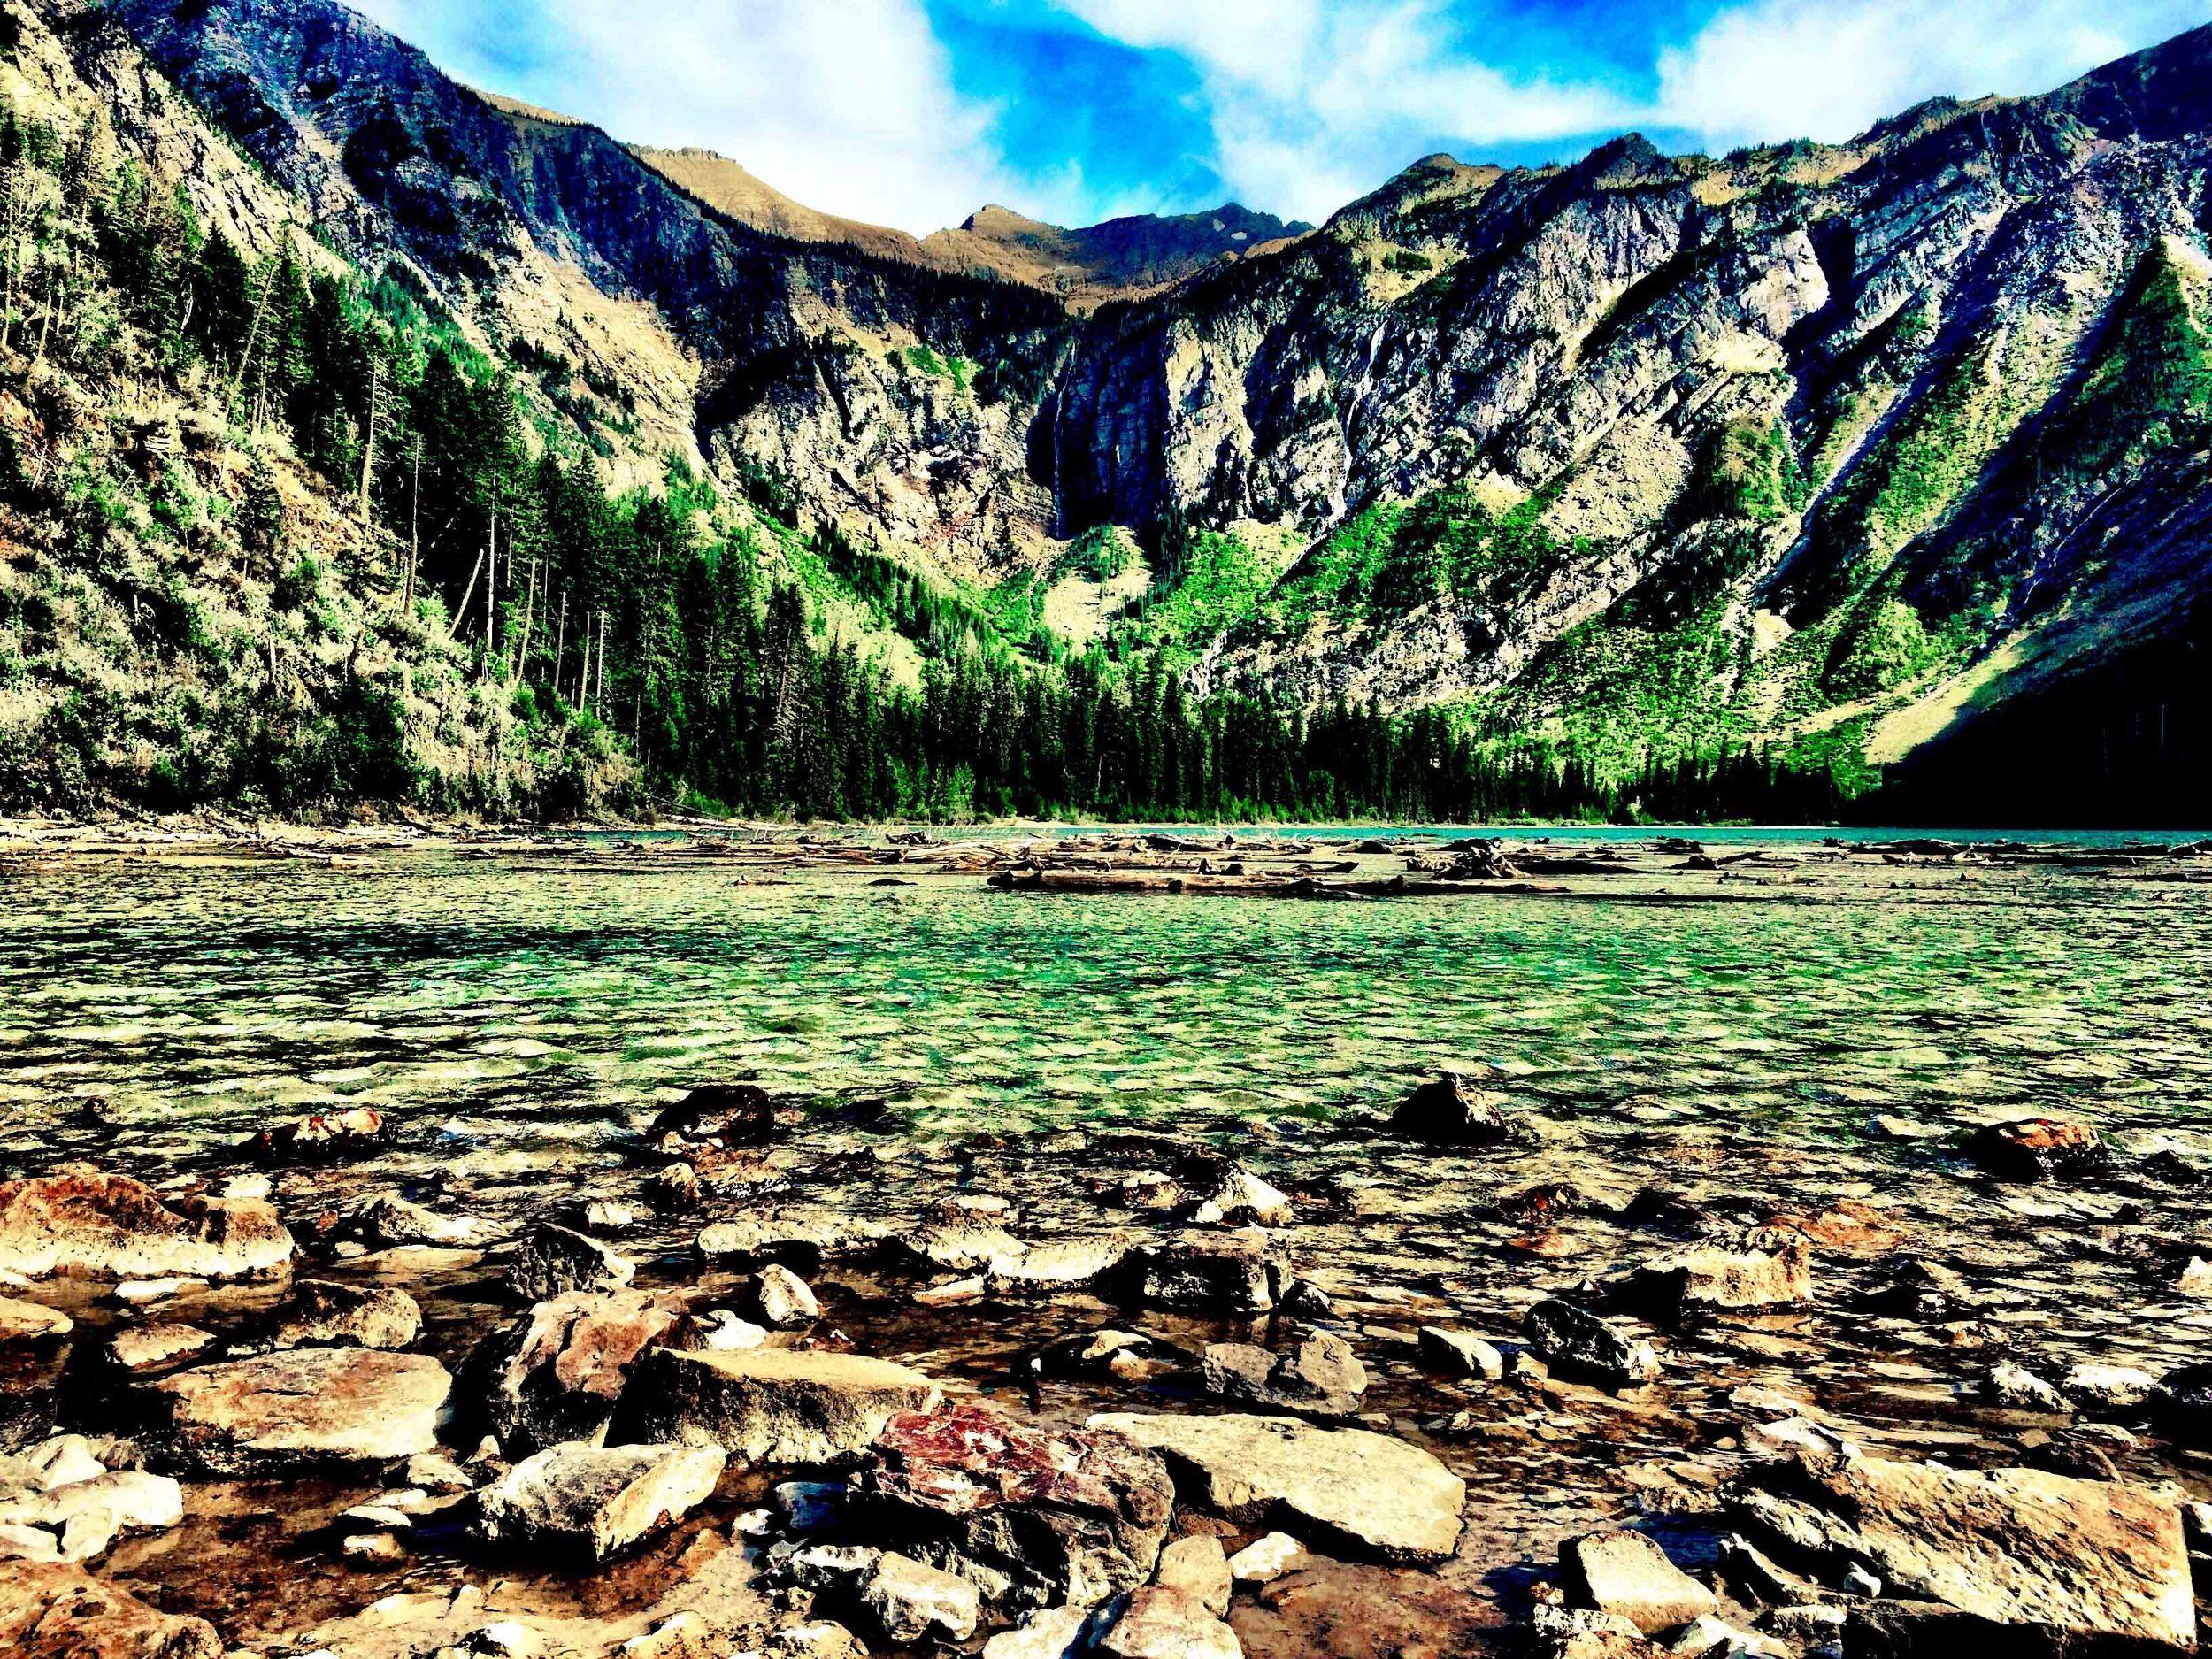 Avalanche Lake, Glacier National Park, Montana, August 2015